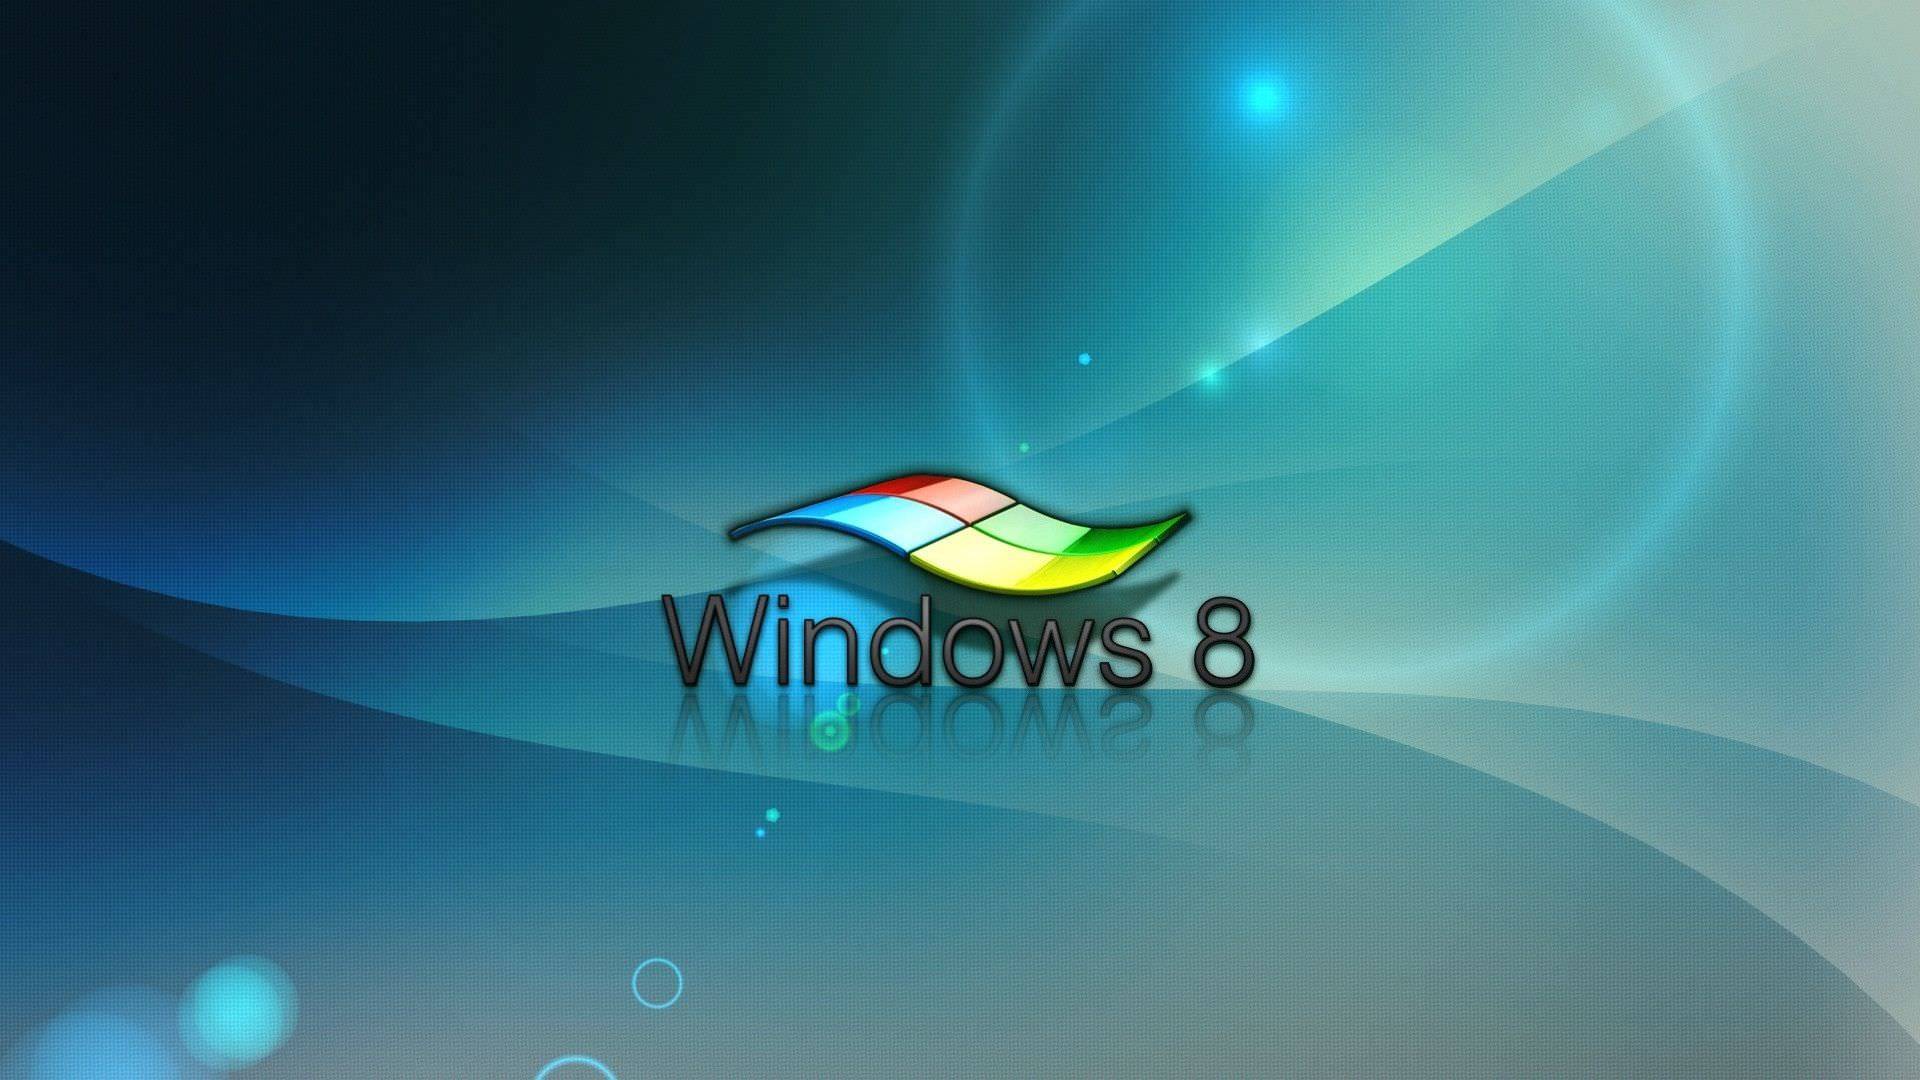 Res: 1920x1080, Window 8 3D Image Wallpaper